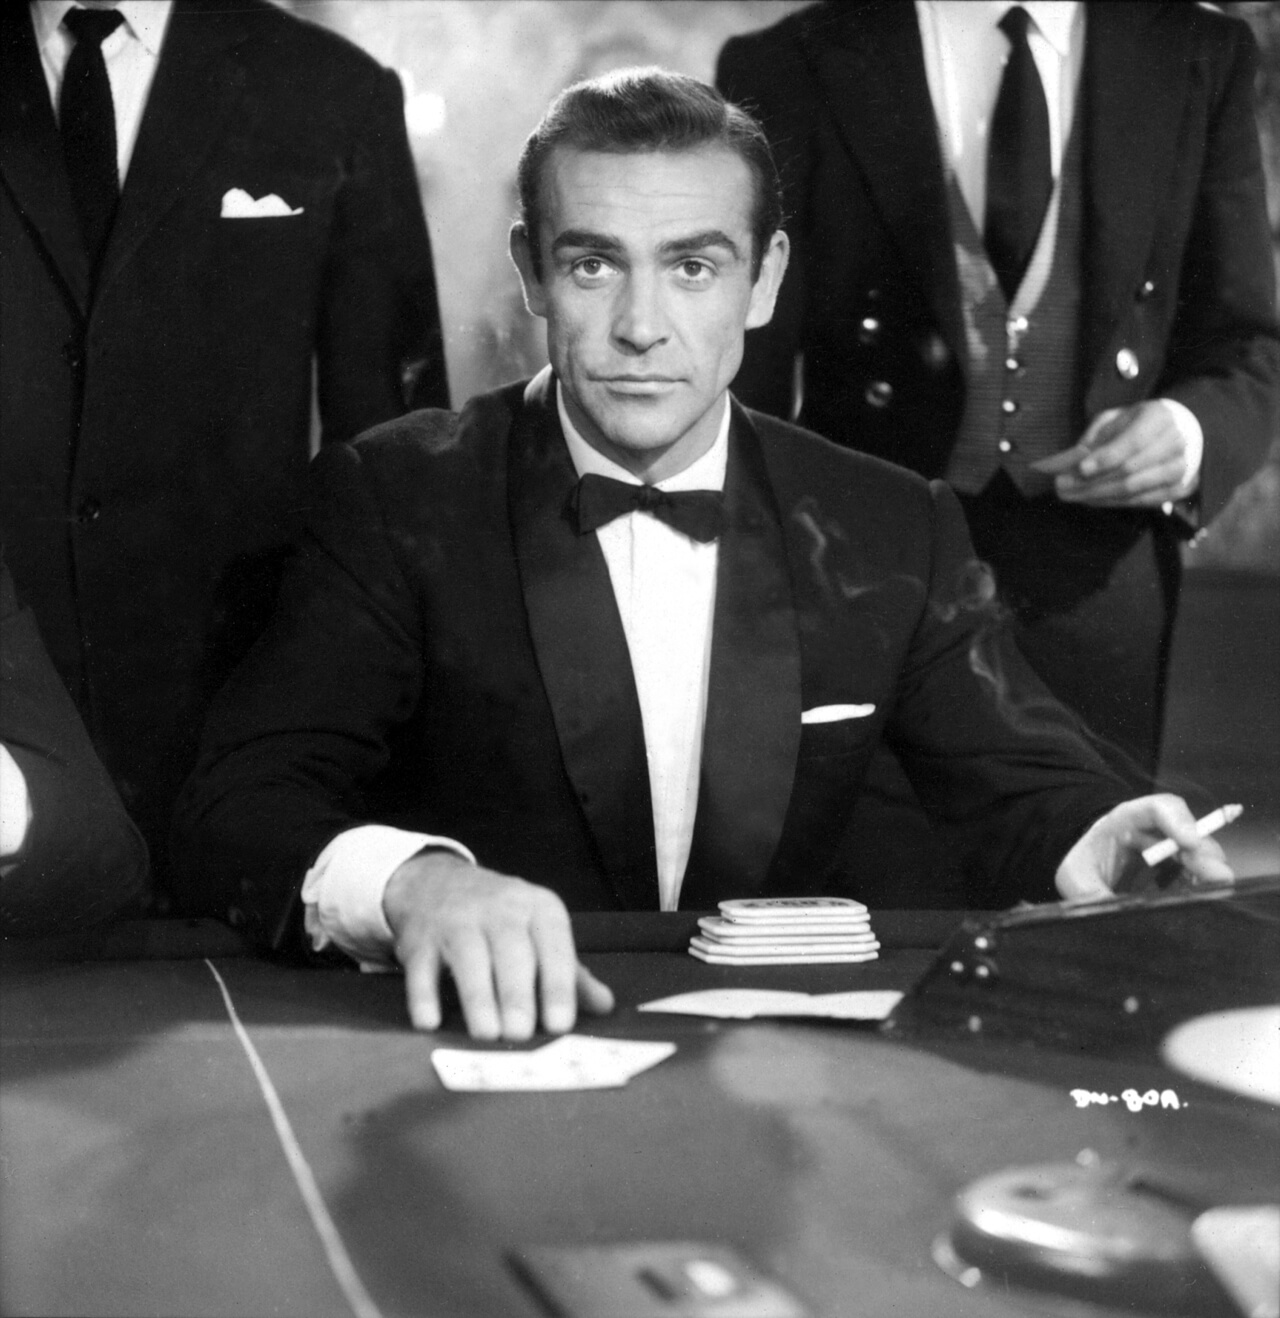 James Bond Baccarat